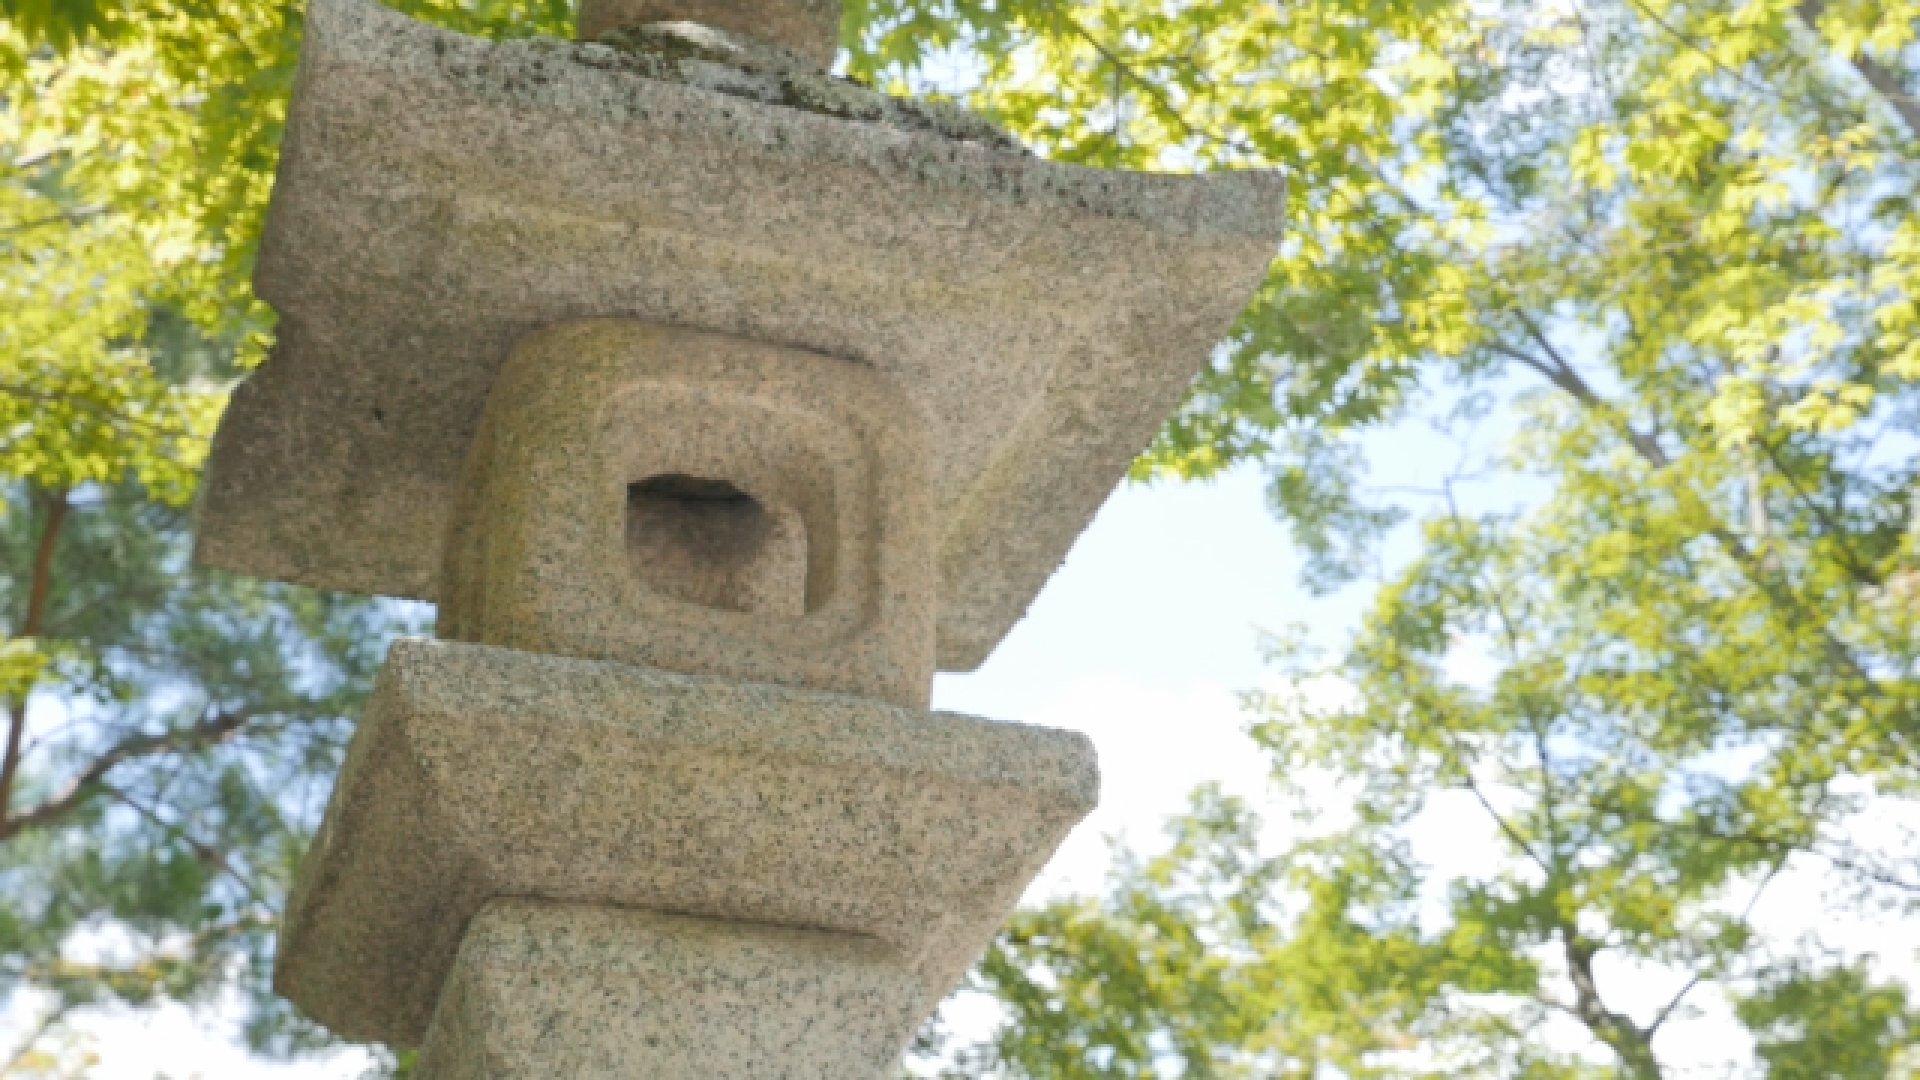 Statue de pierre